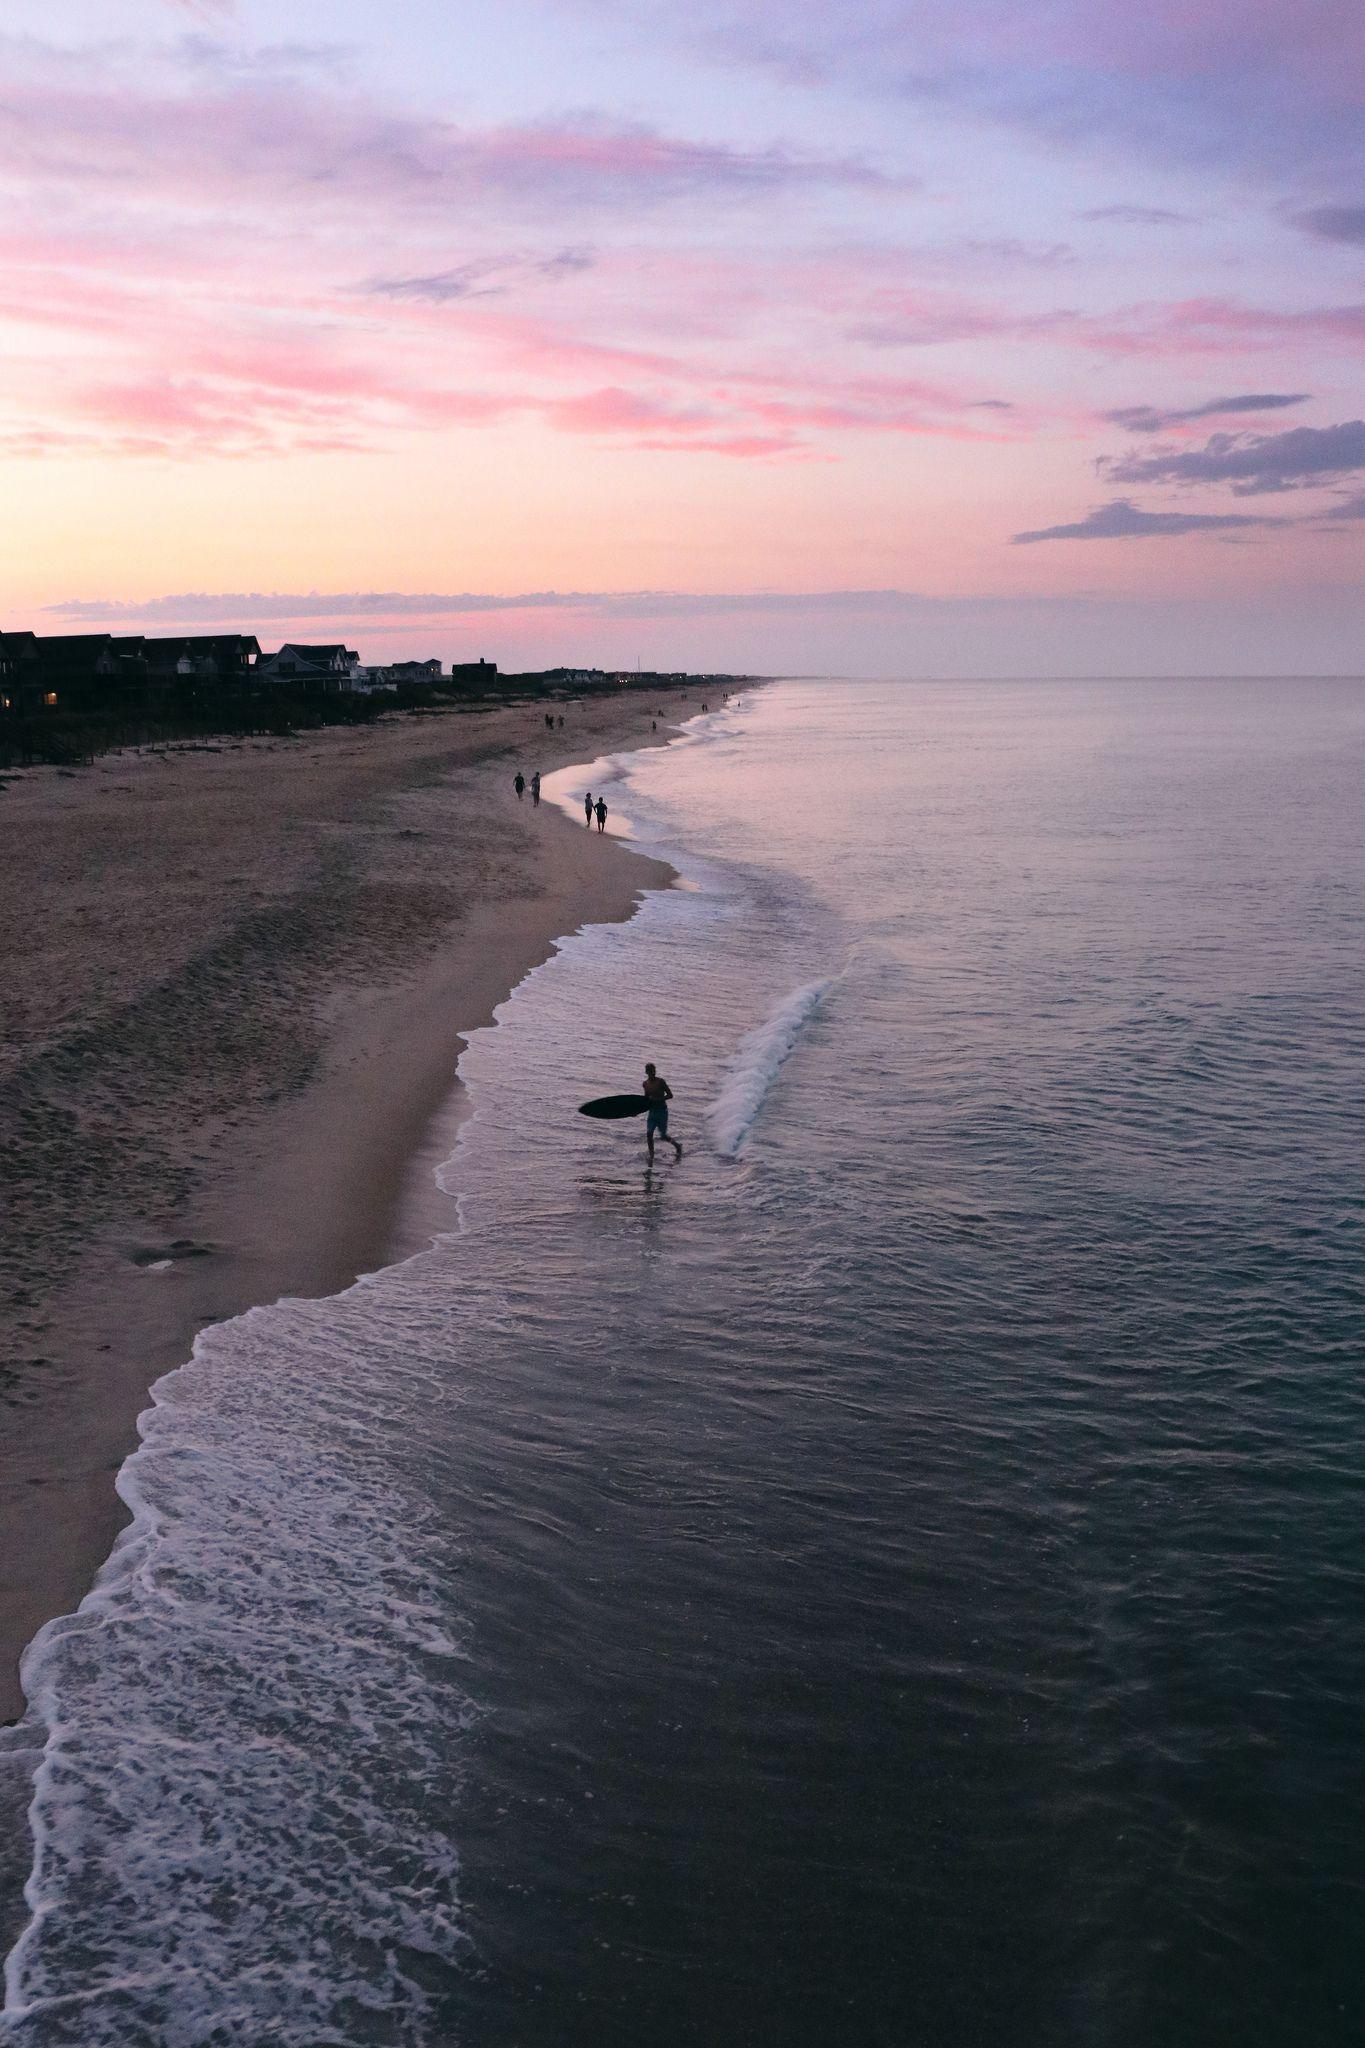 Surfer At Sunset Sunset Surf Surfing Wallpaper Beach Landscape